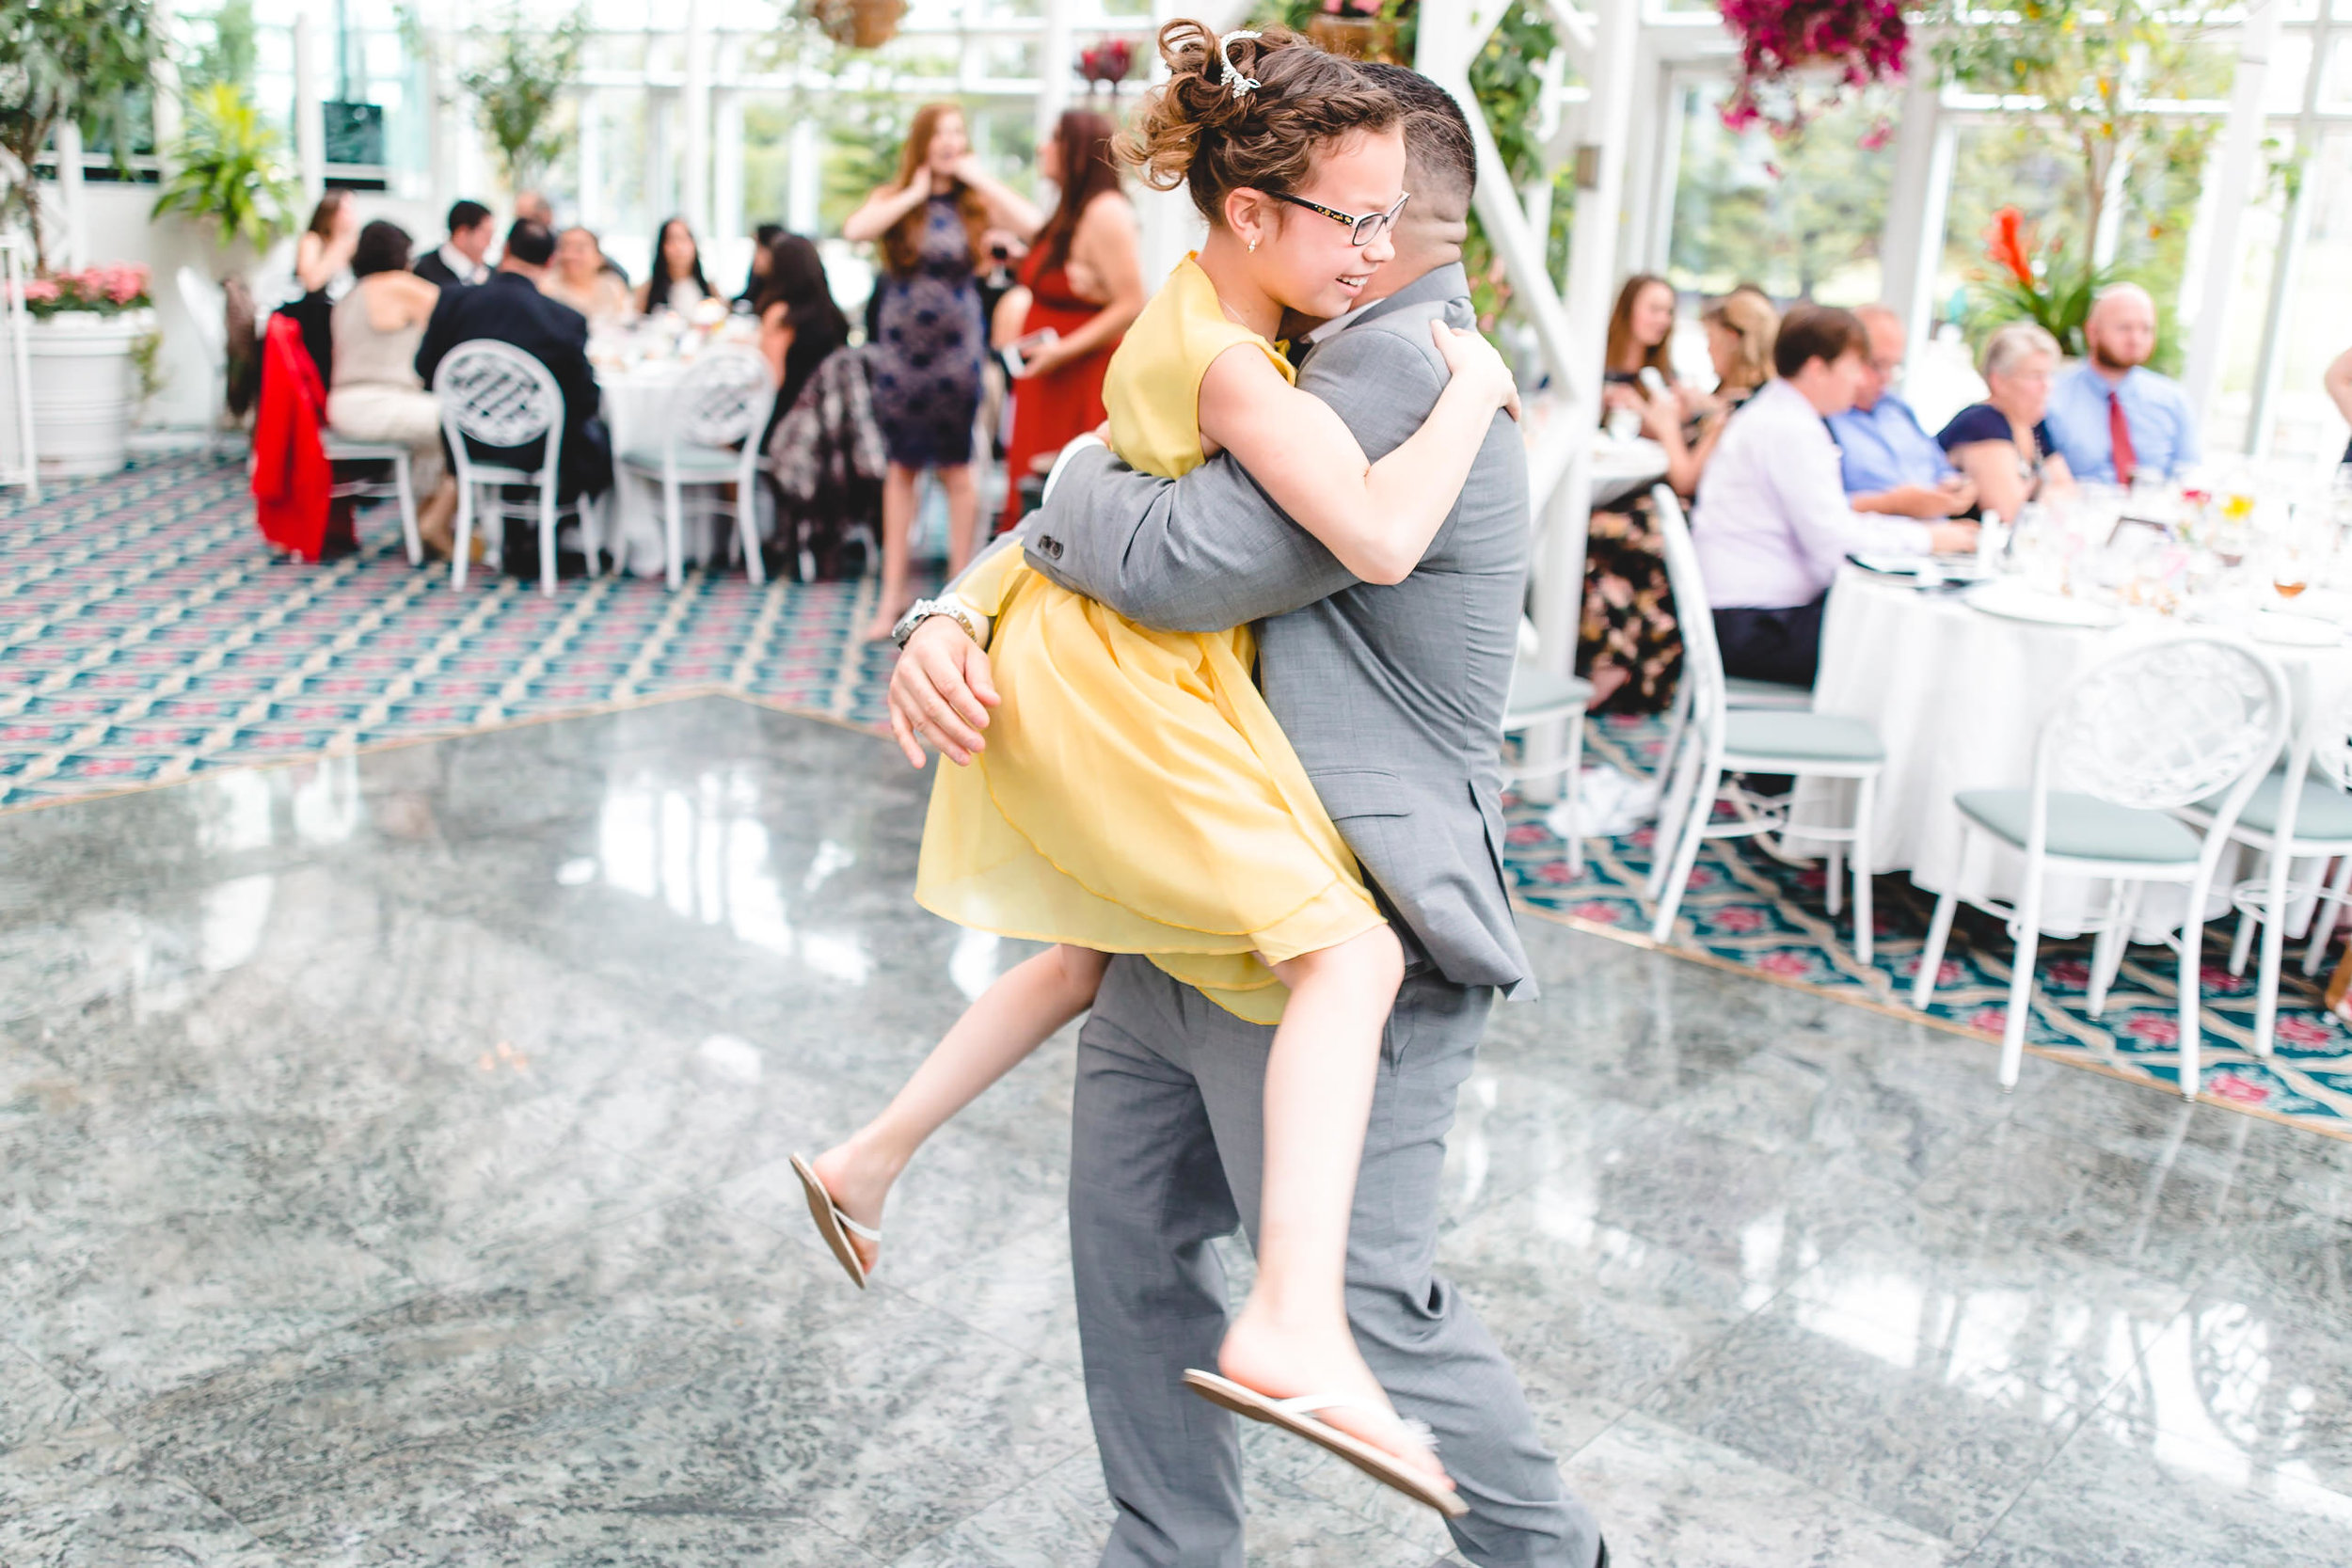 daniel_nydick_nj_photographer_headshot_wedding_event_family-29.jpg